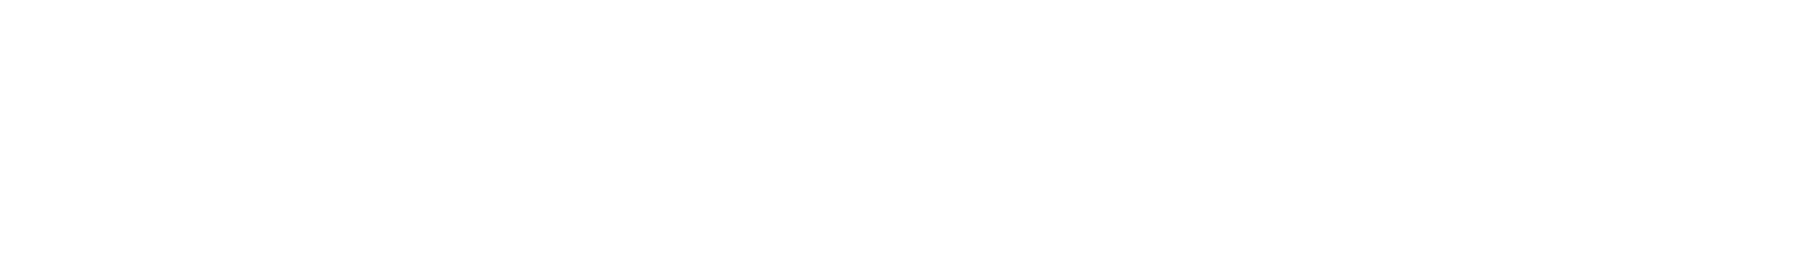 cymatics   brass loop 10   dm 140 bpm